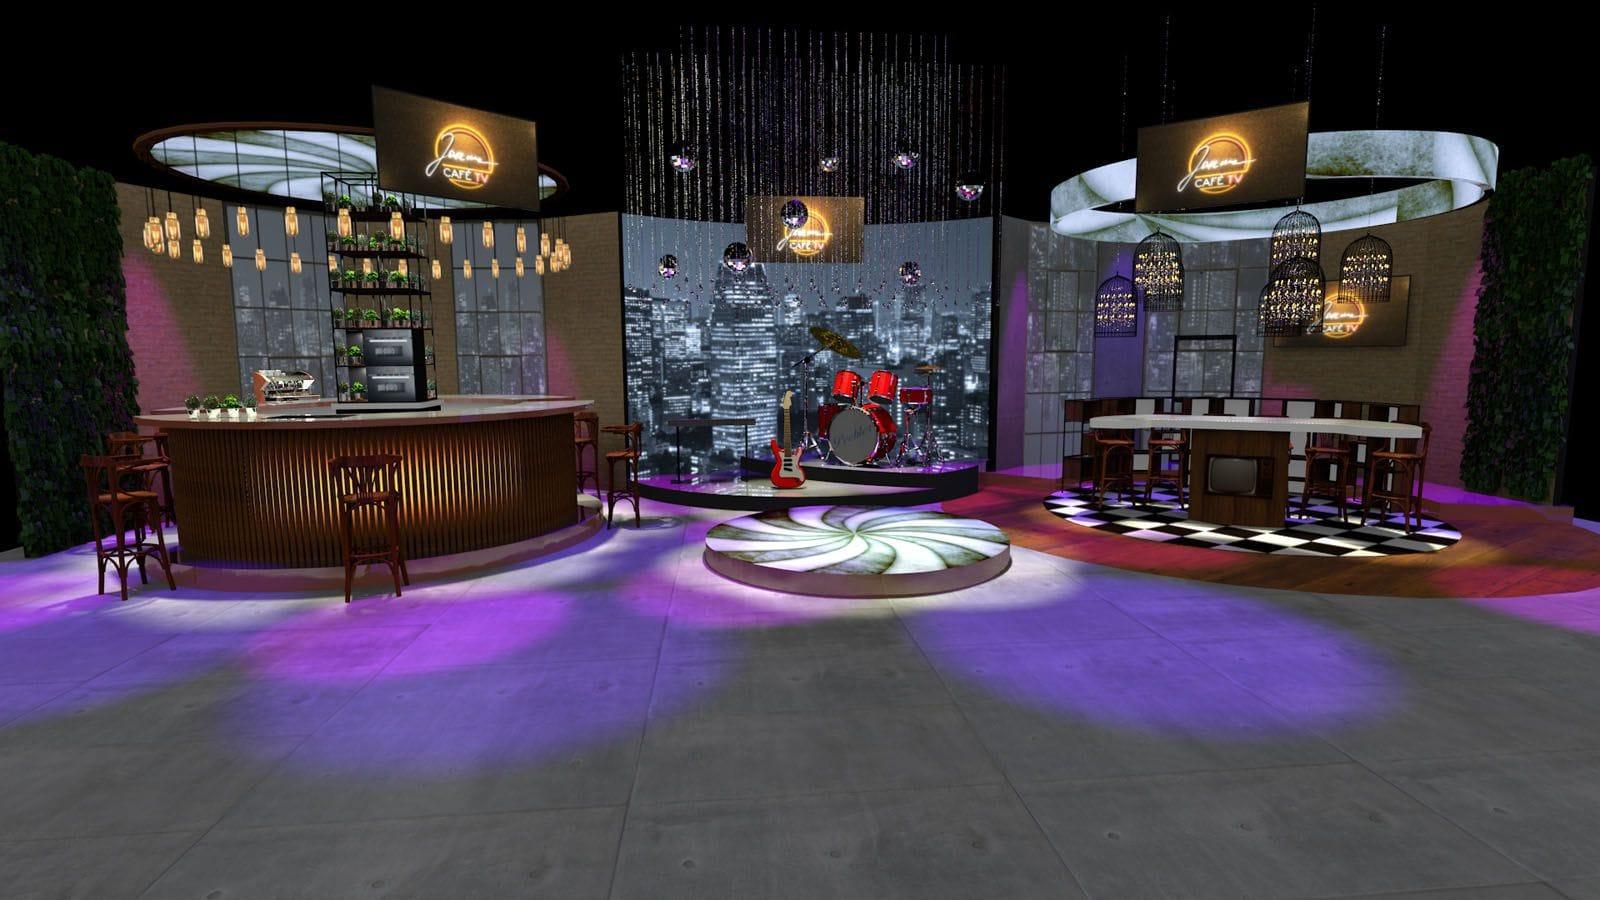 studio telewizyjne - scenografia 3D